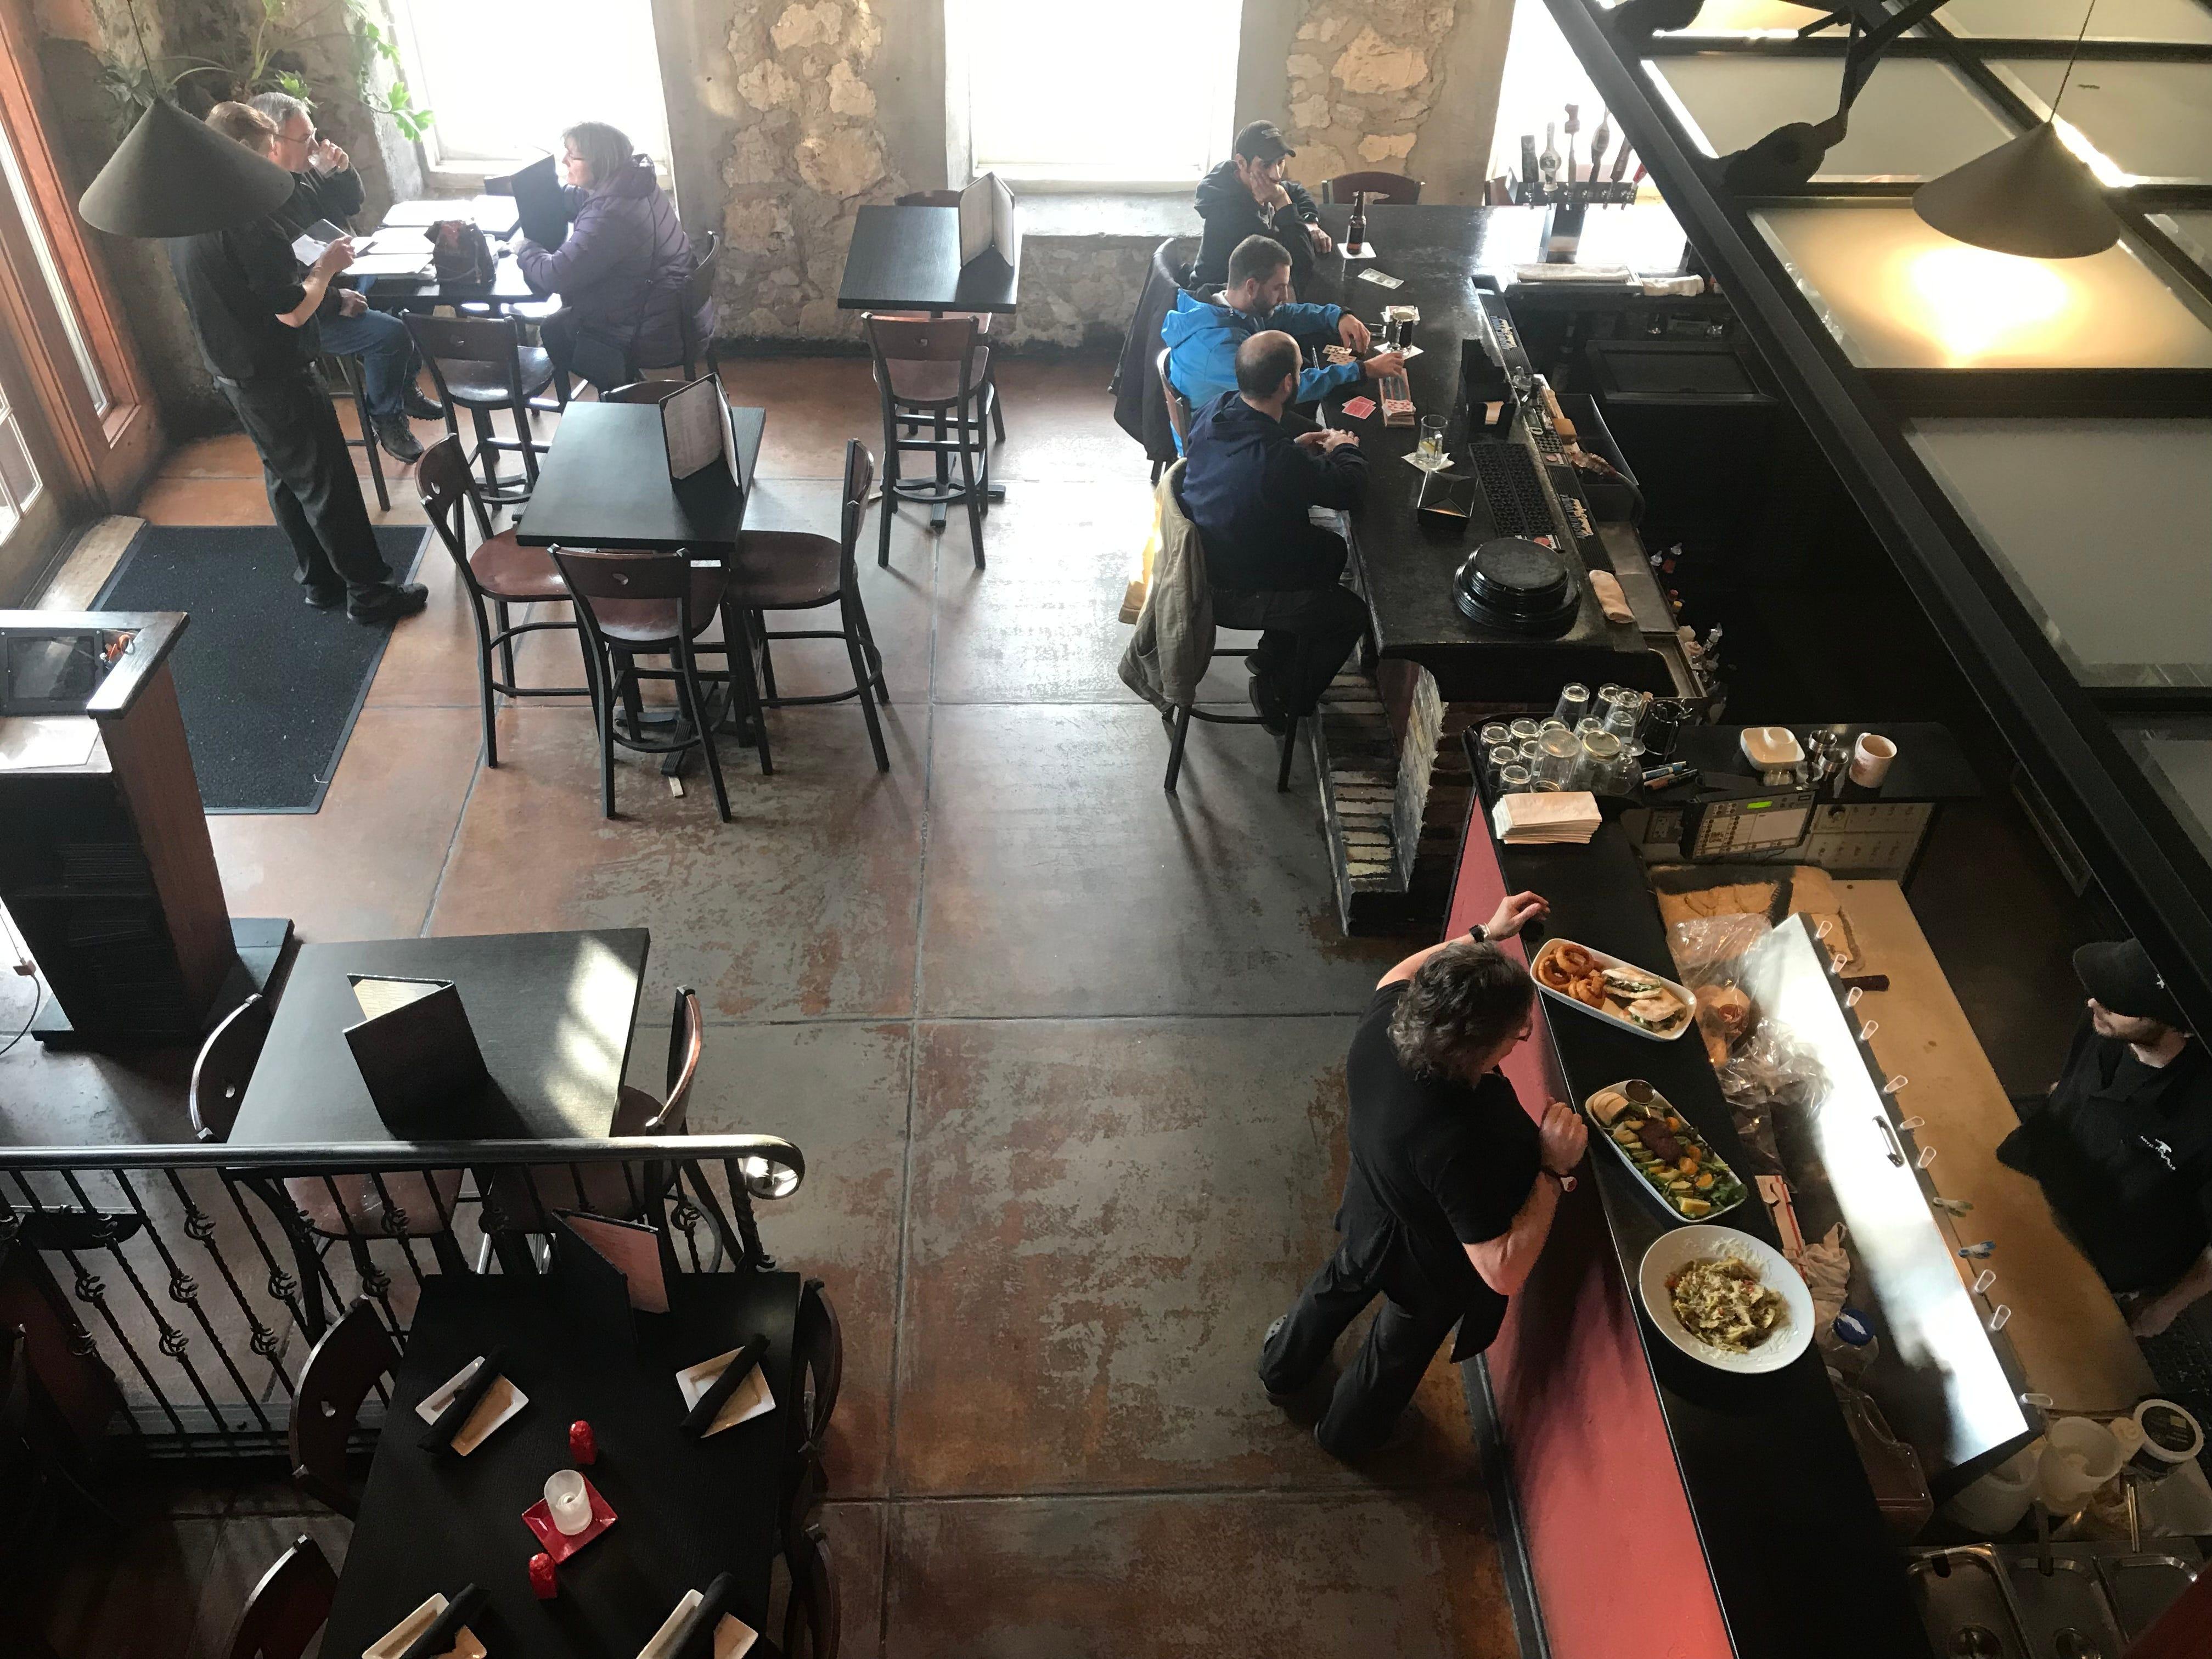 Anvil Pub & Grille includes a mezzanine level added